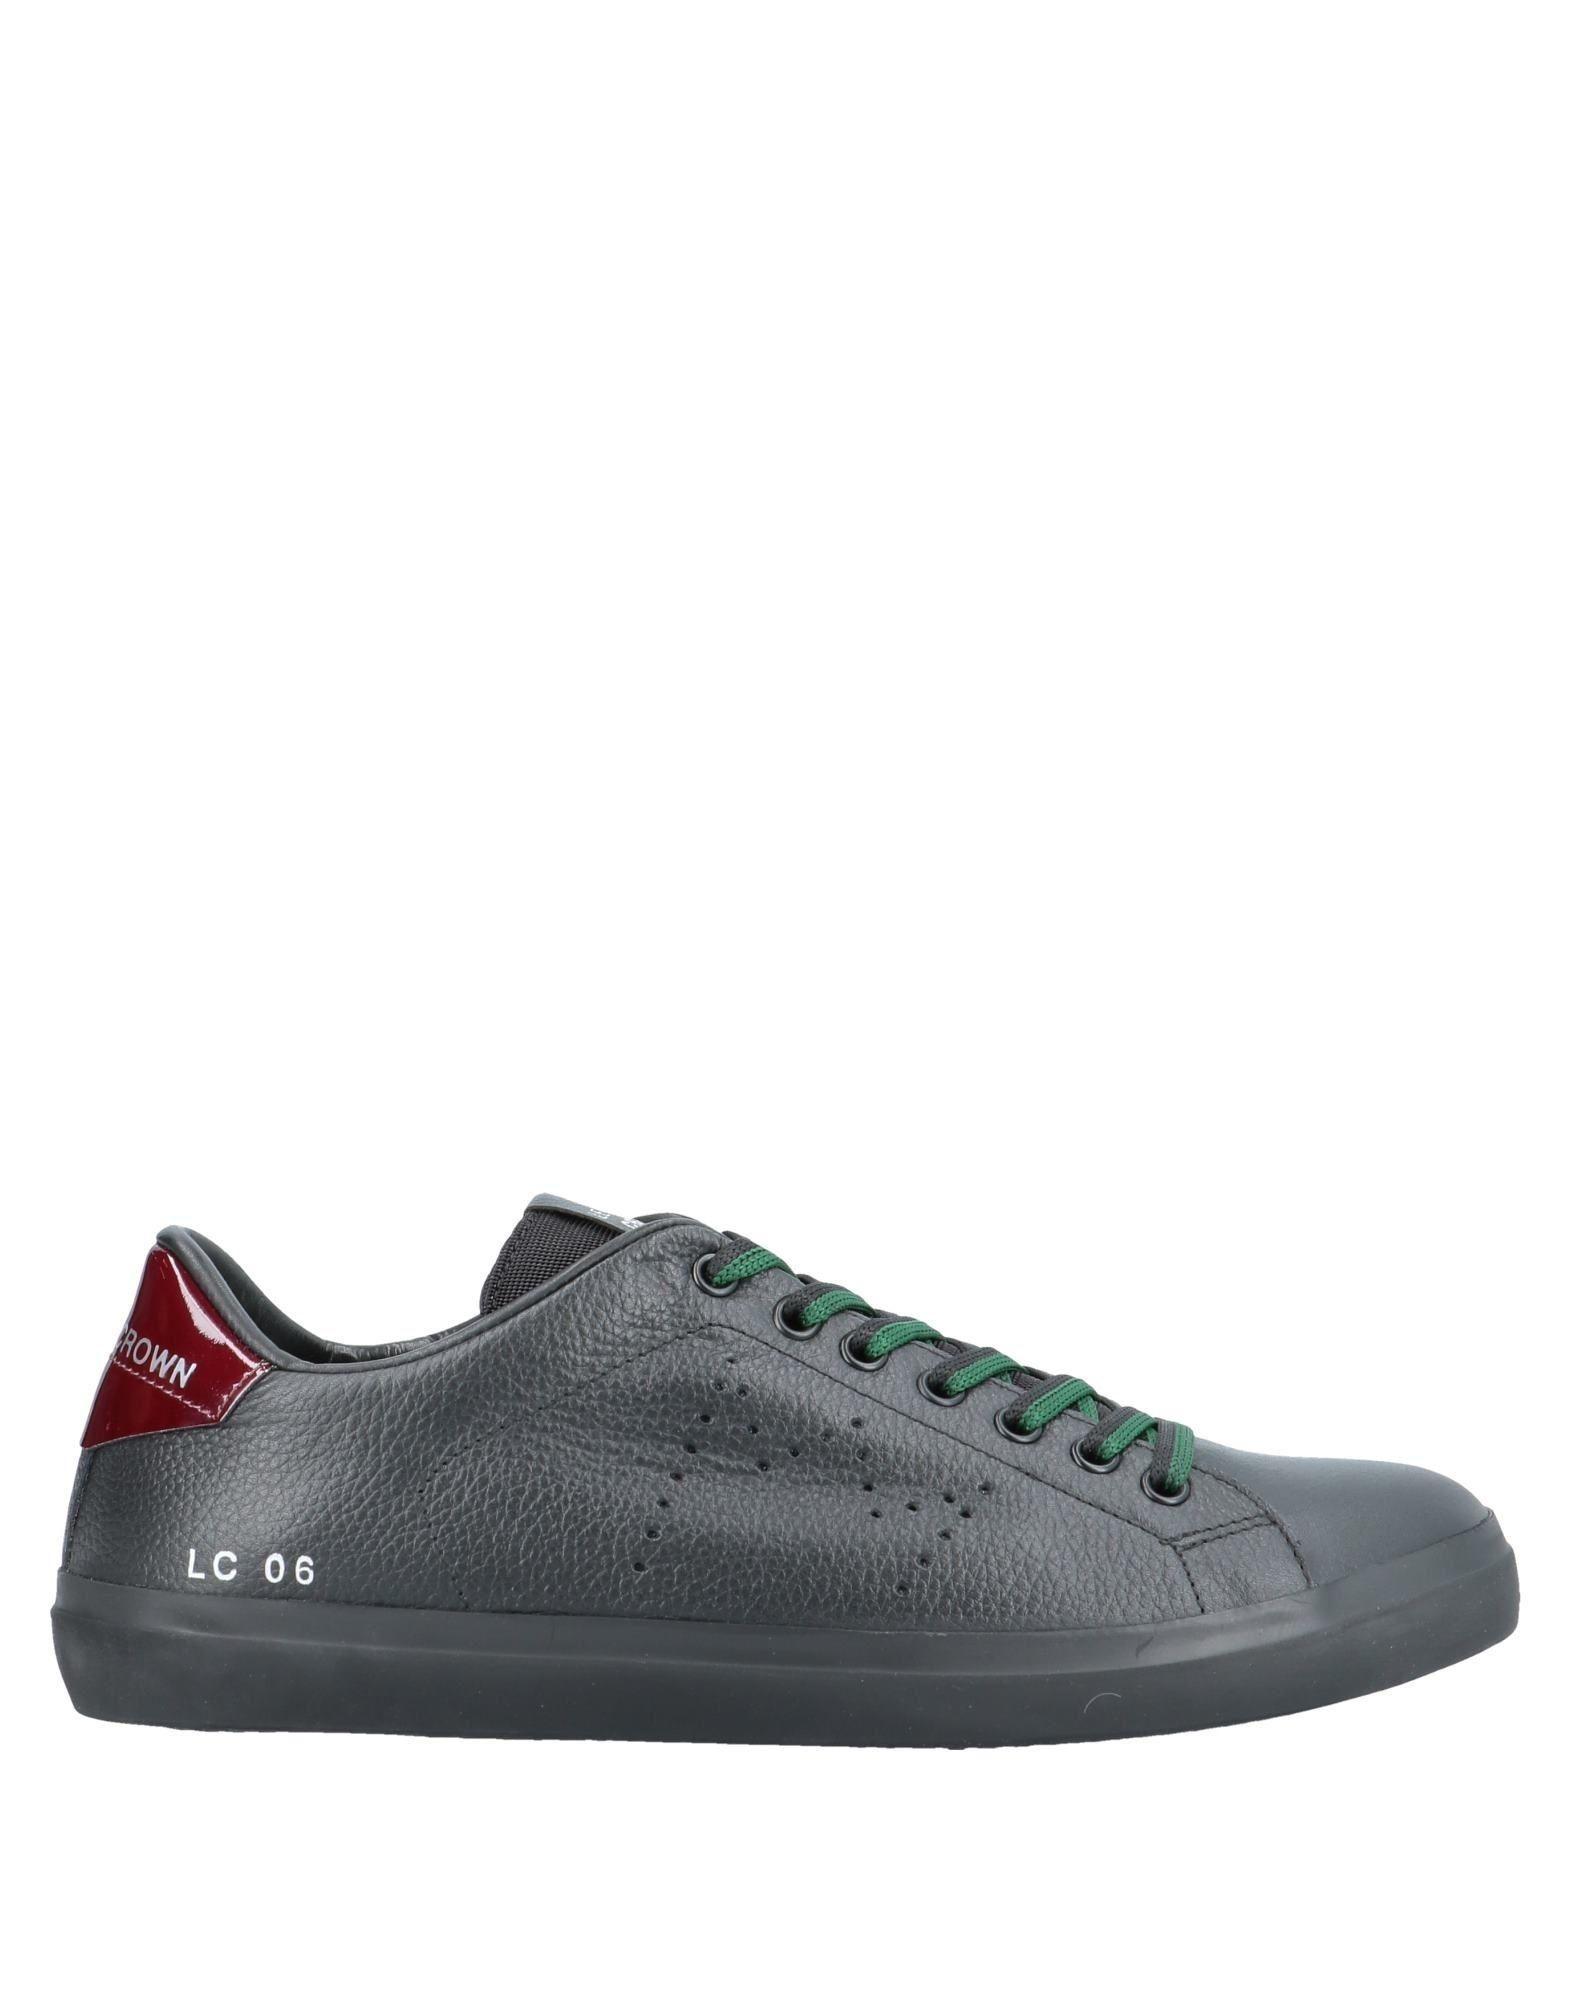 Turnschuhe Leather Crown herren - 11660216XH